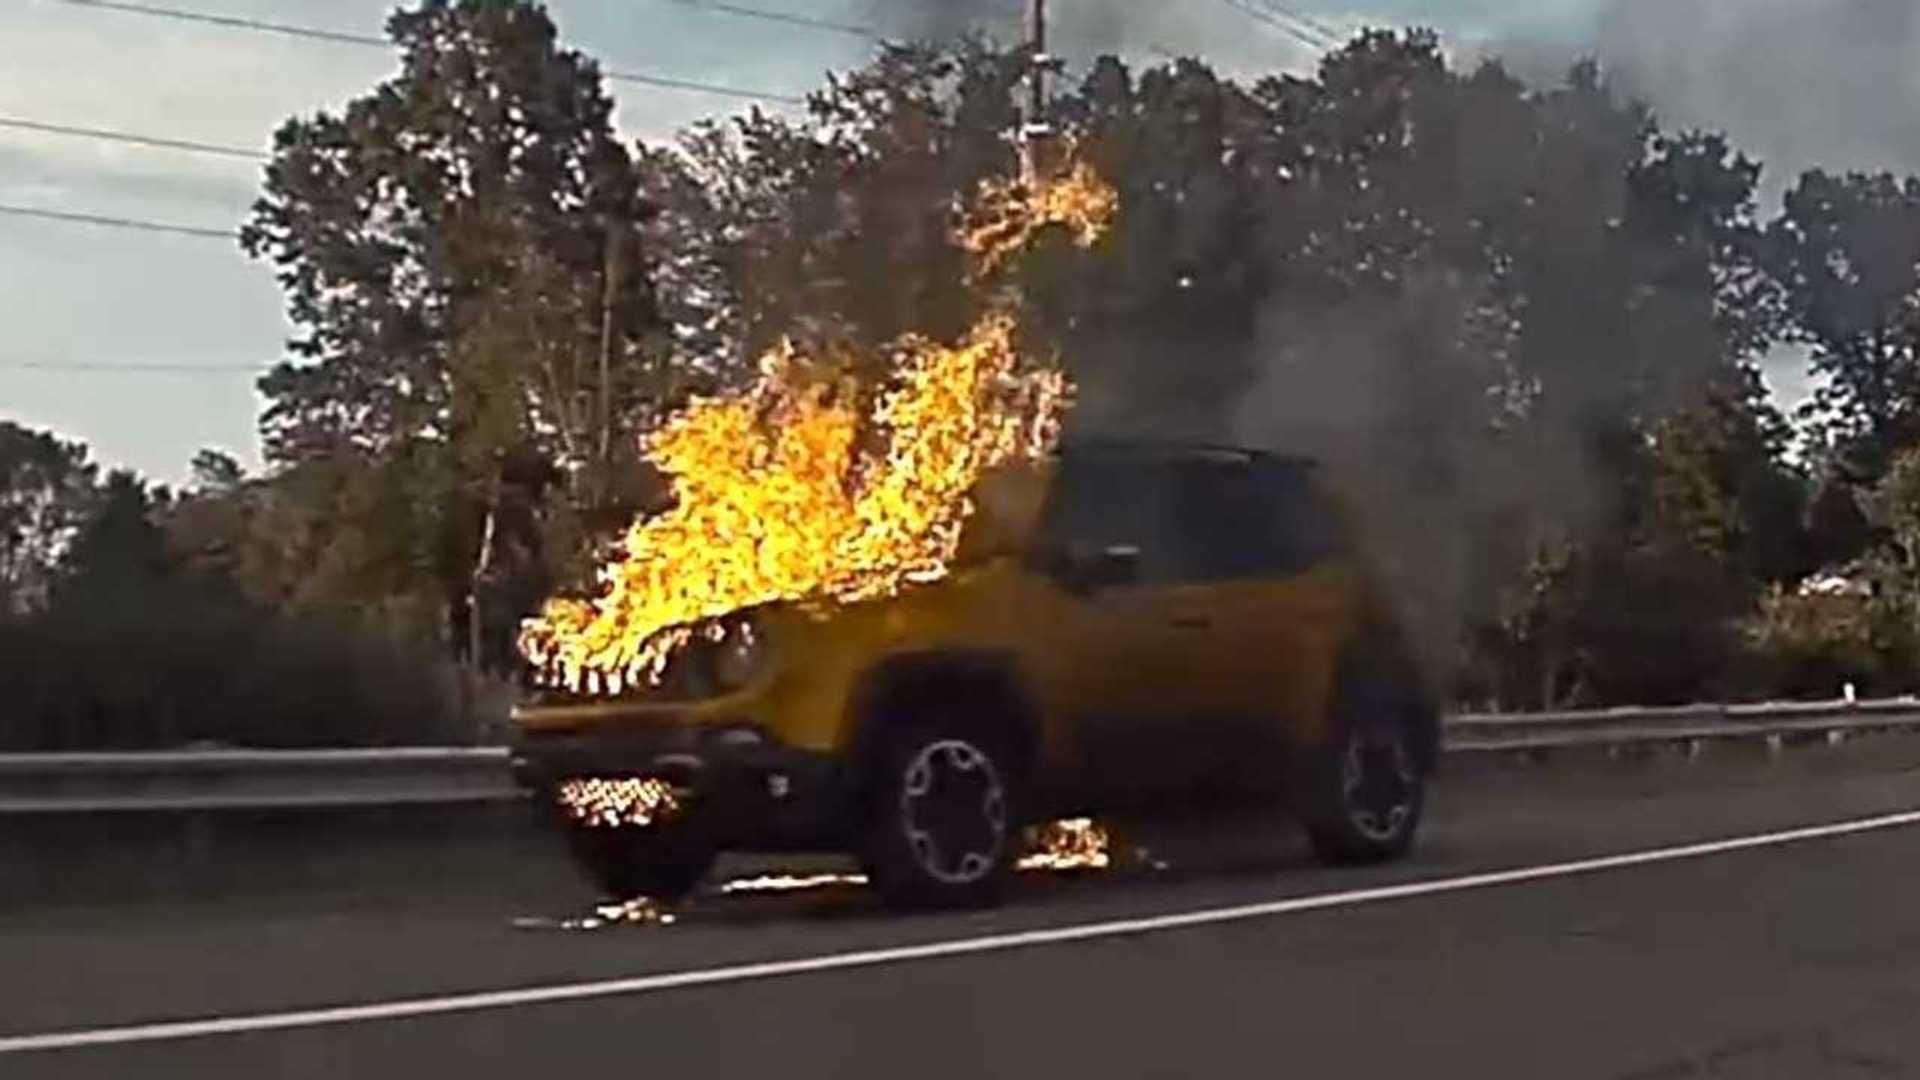 Not-A-Tesla Fire: Teslacam Captures Jeep Renegade Ablaze